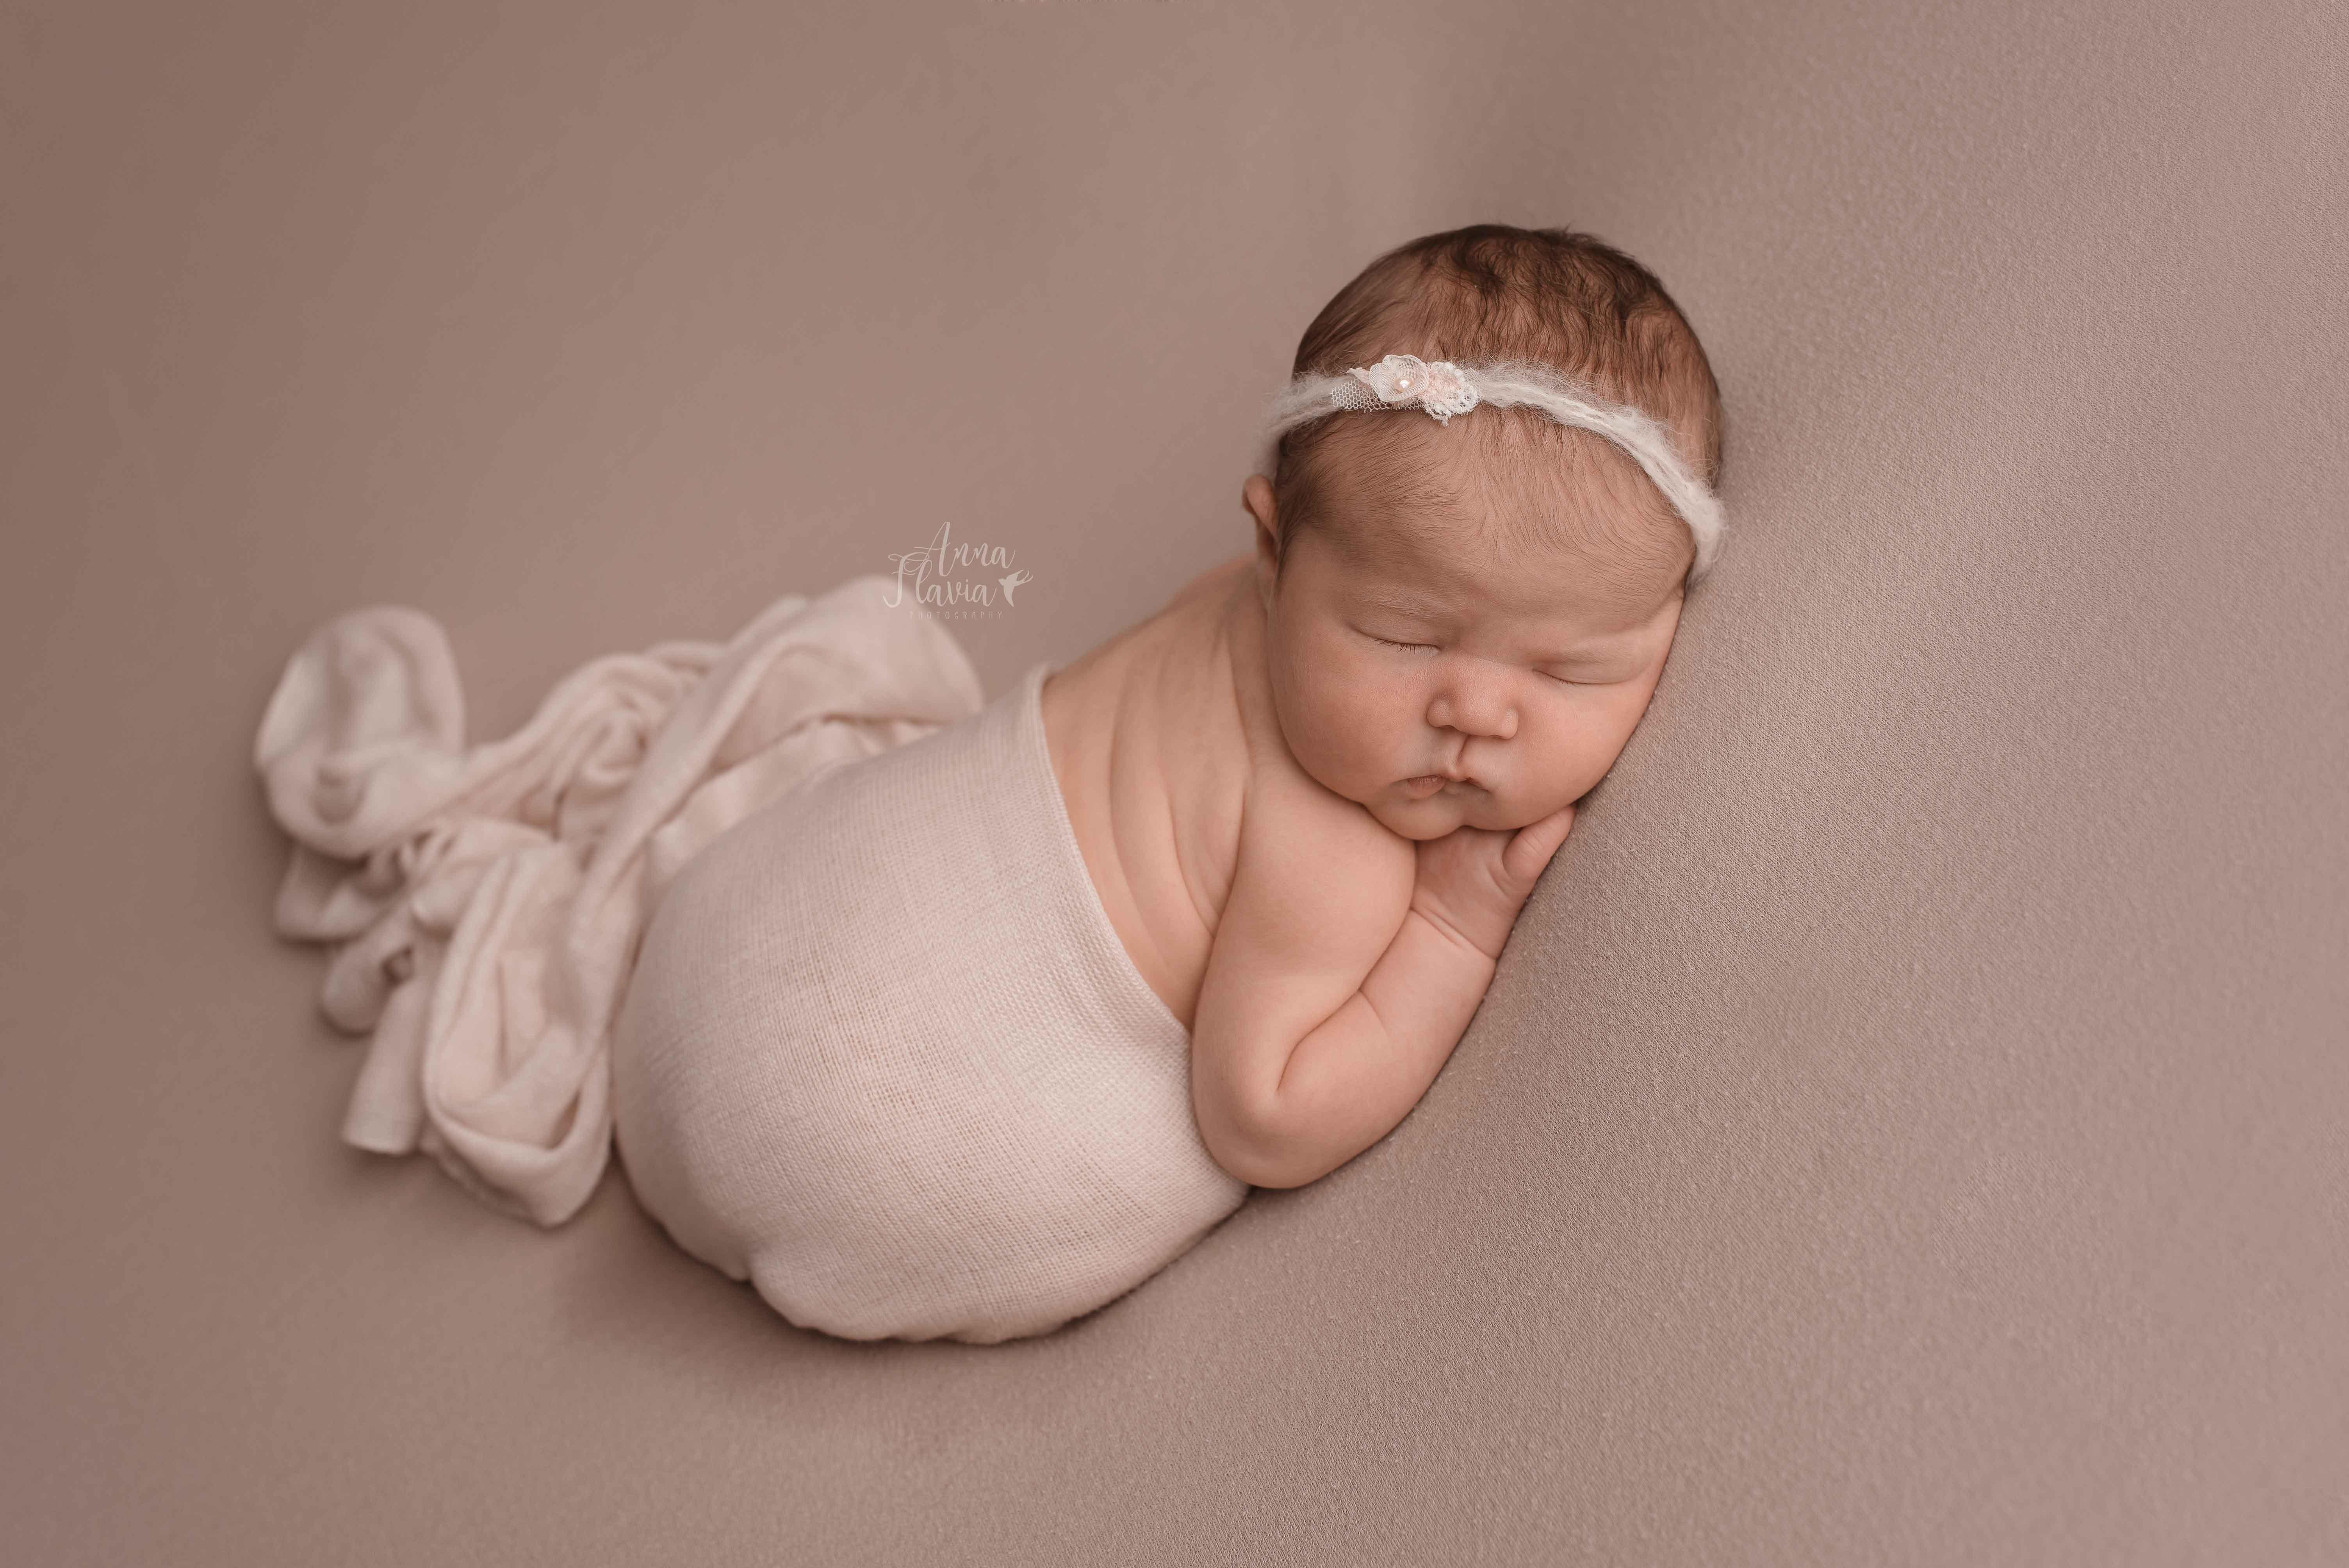 Anna_Flavia_Photographer_Dublin_maternity_newborn_families_baby_children